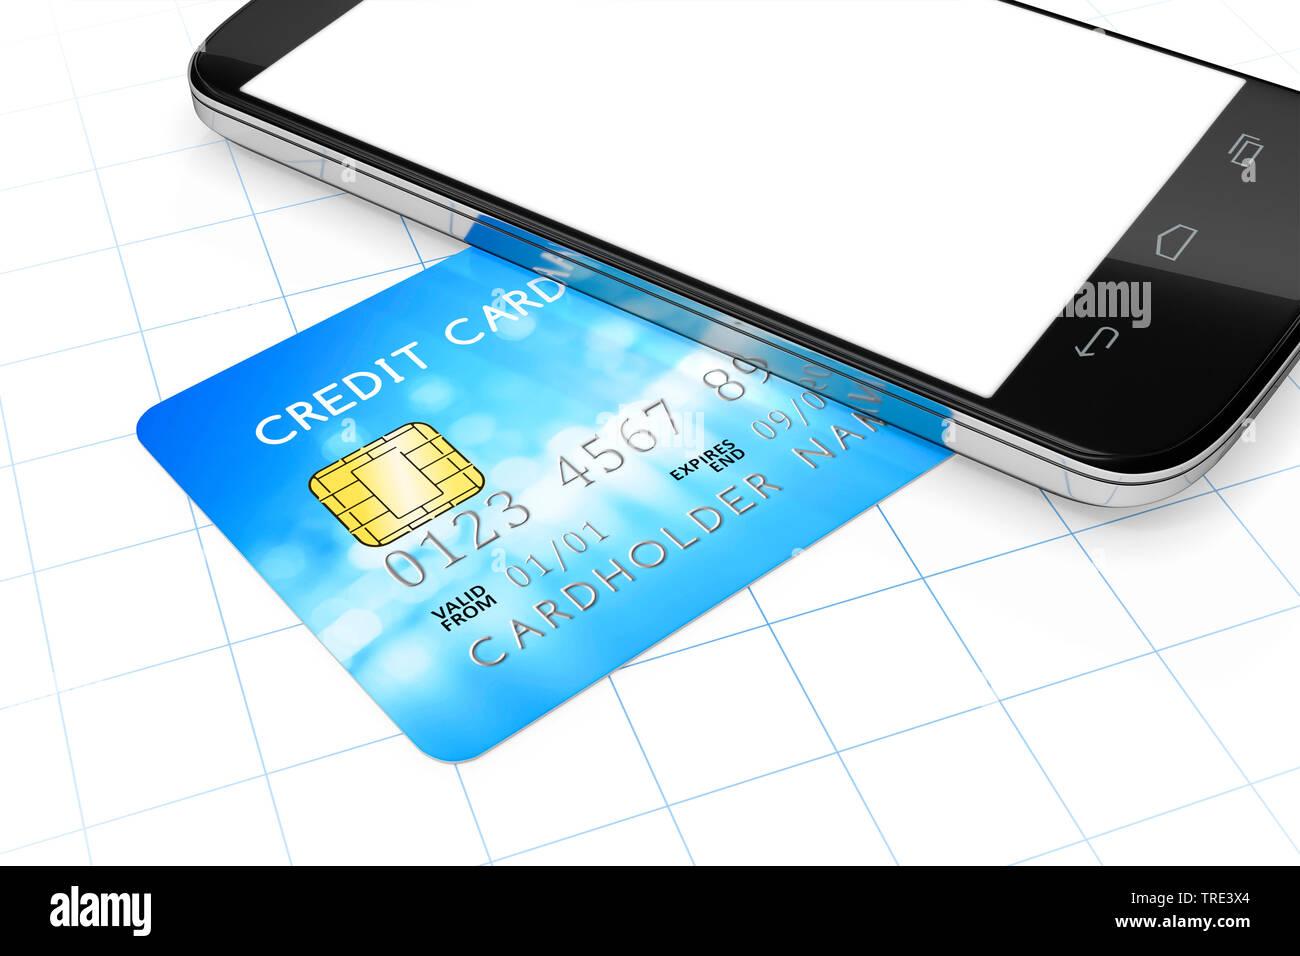 3D-Computergrafik, Mobiltelefon auf einer Kreditkarte liegend (Mobile Payment) | 3D computer graphic, mobile phone lying on a credit card (mobile paym - Stock Image